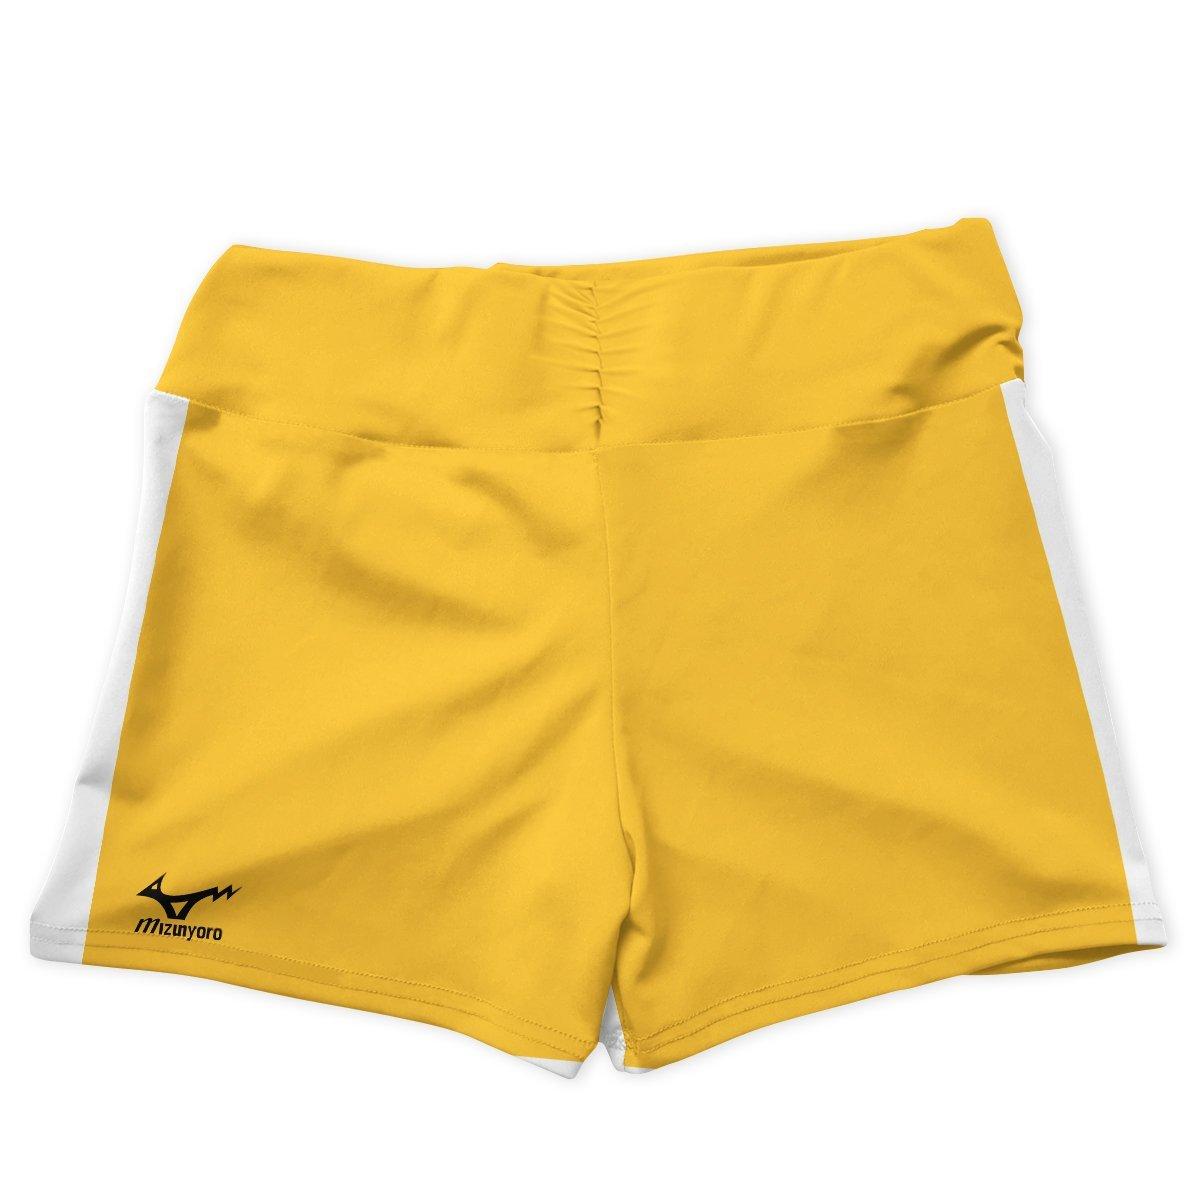 team johzenji active wear set 517825 - Anime Swimsuits